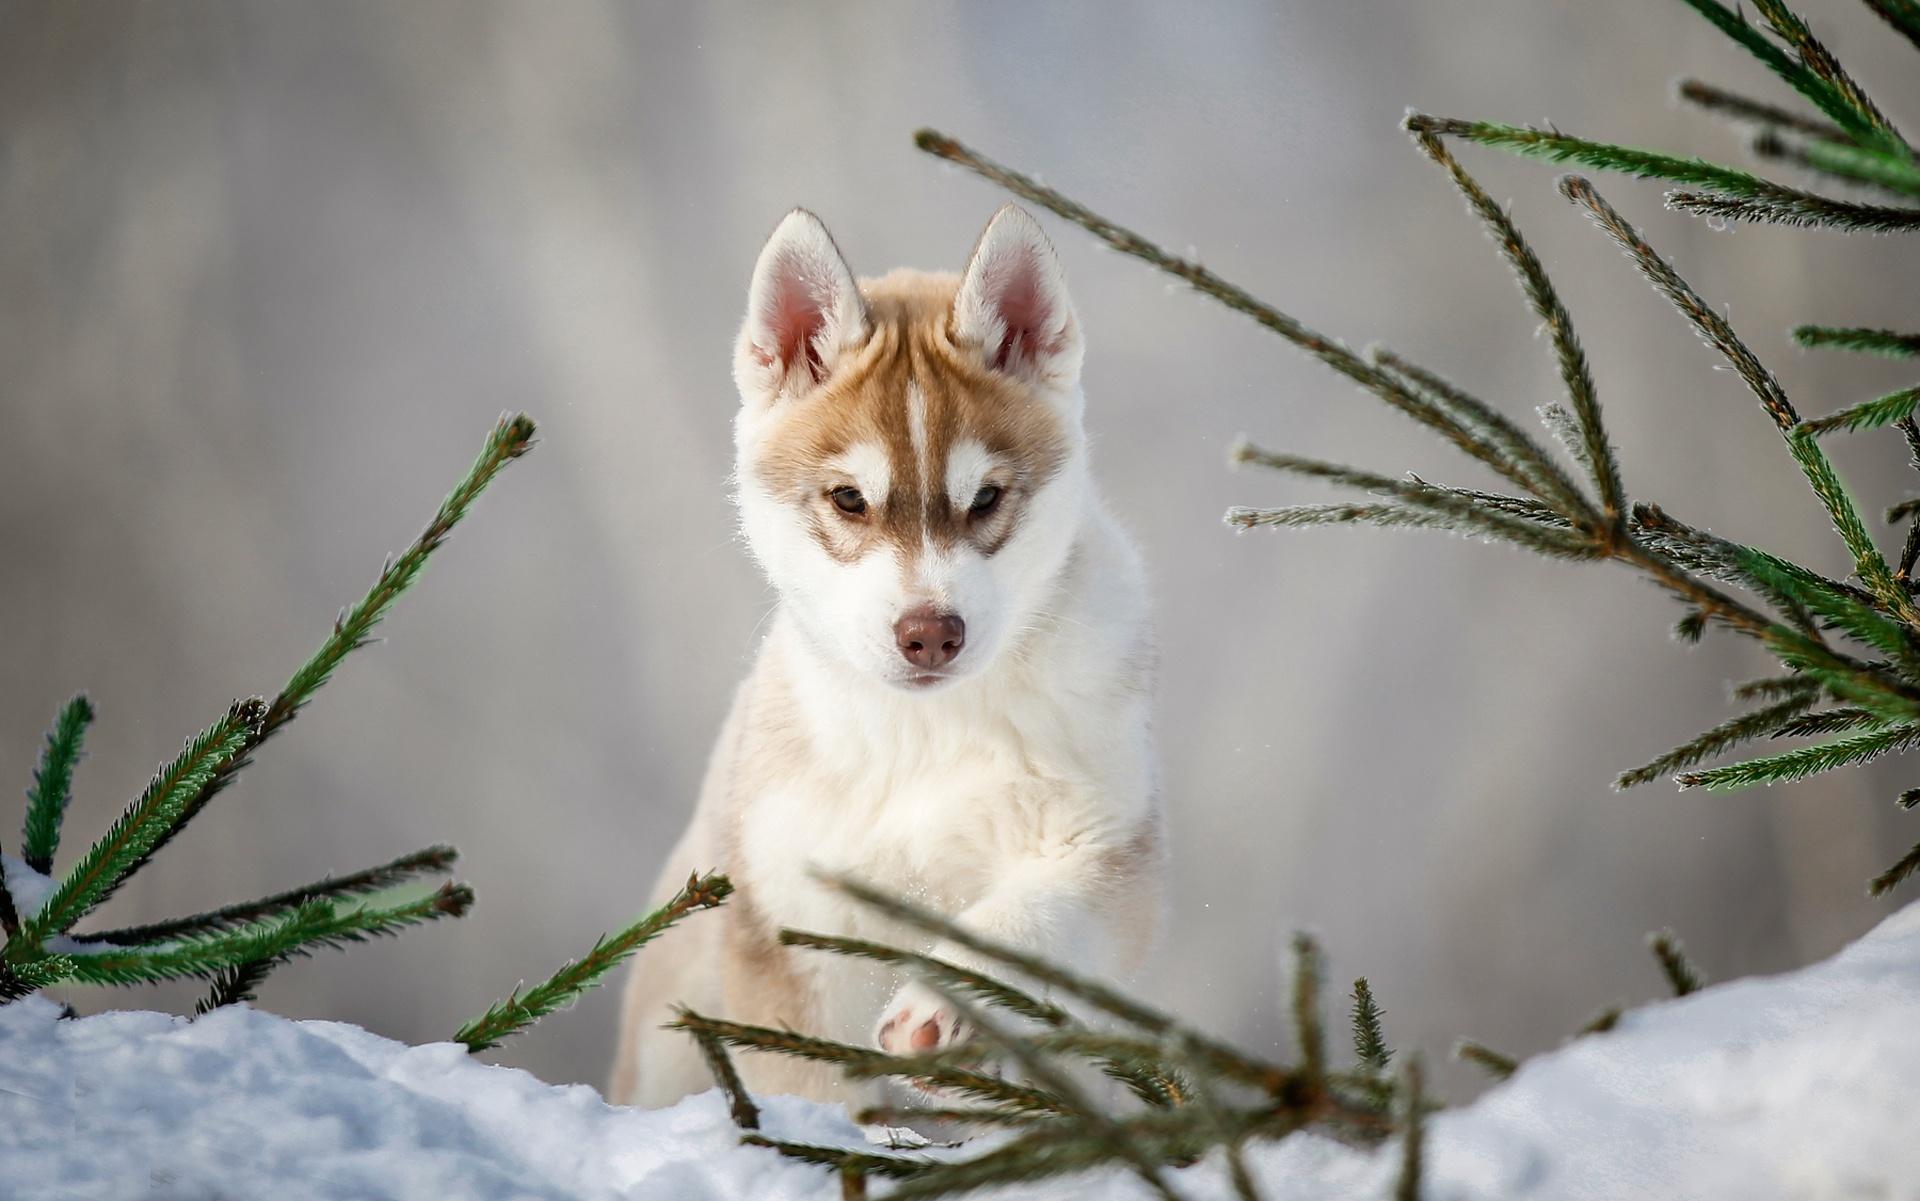 Dog Pet Baby Animal Puppy 1920x1201